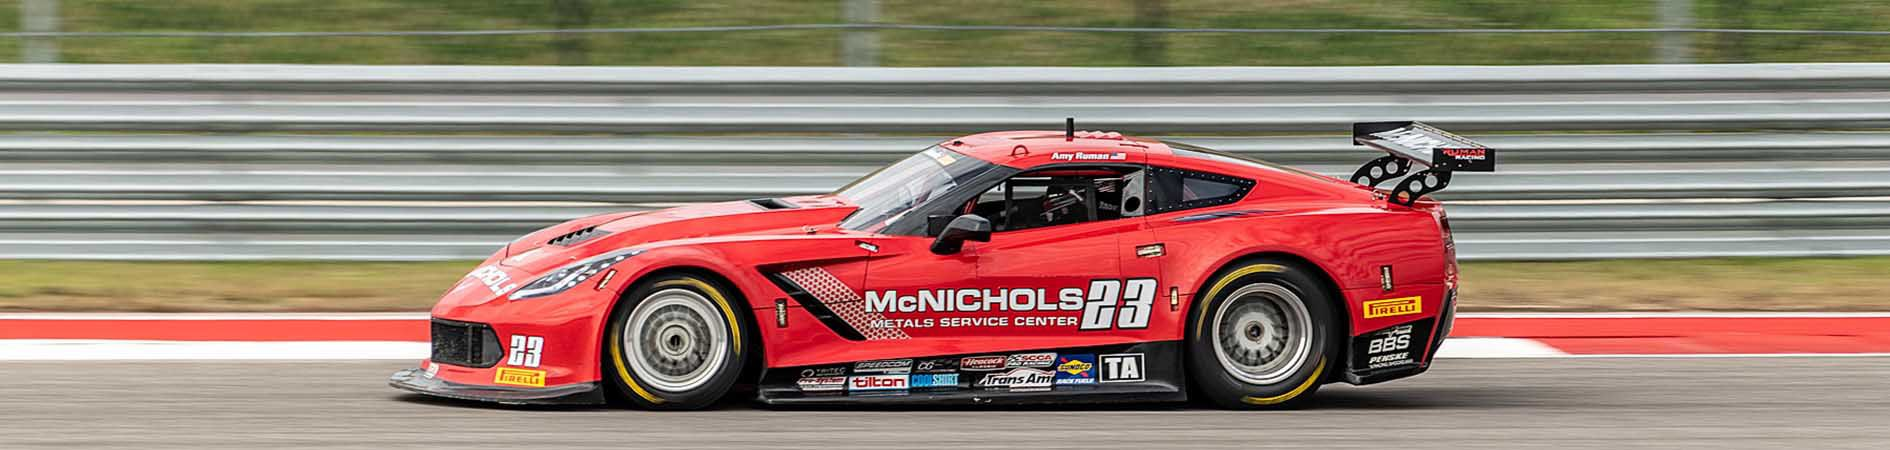 Ruman Racing Sponsored Corvette | McNICHOLS®